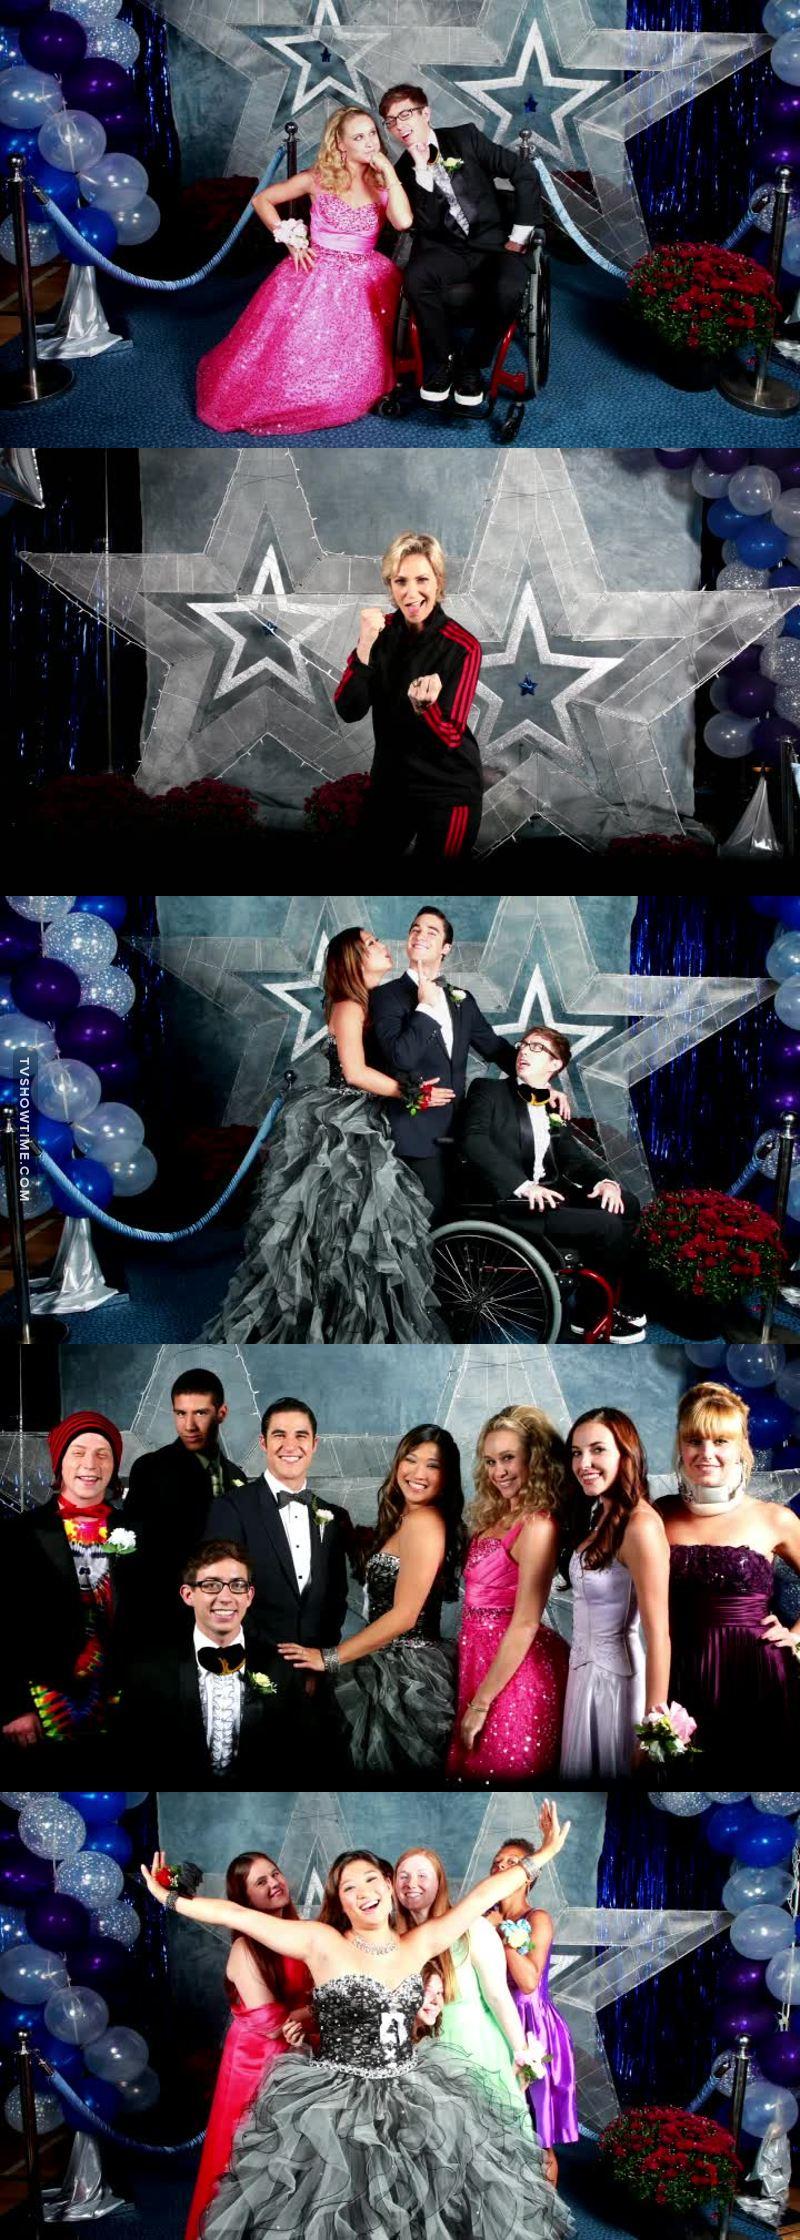 I love the Prom photos ❤